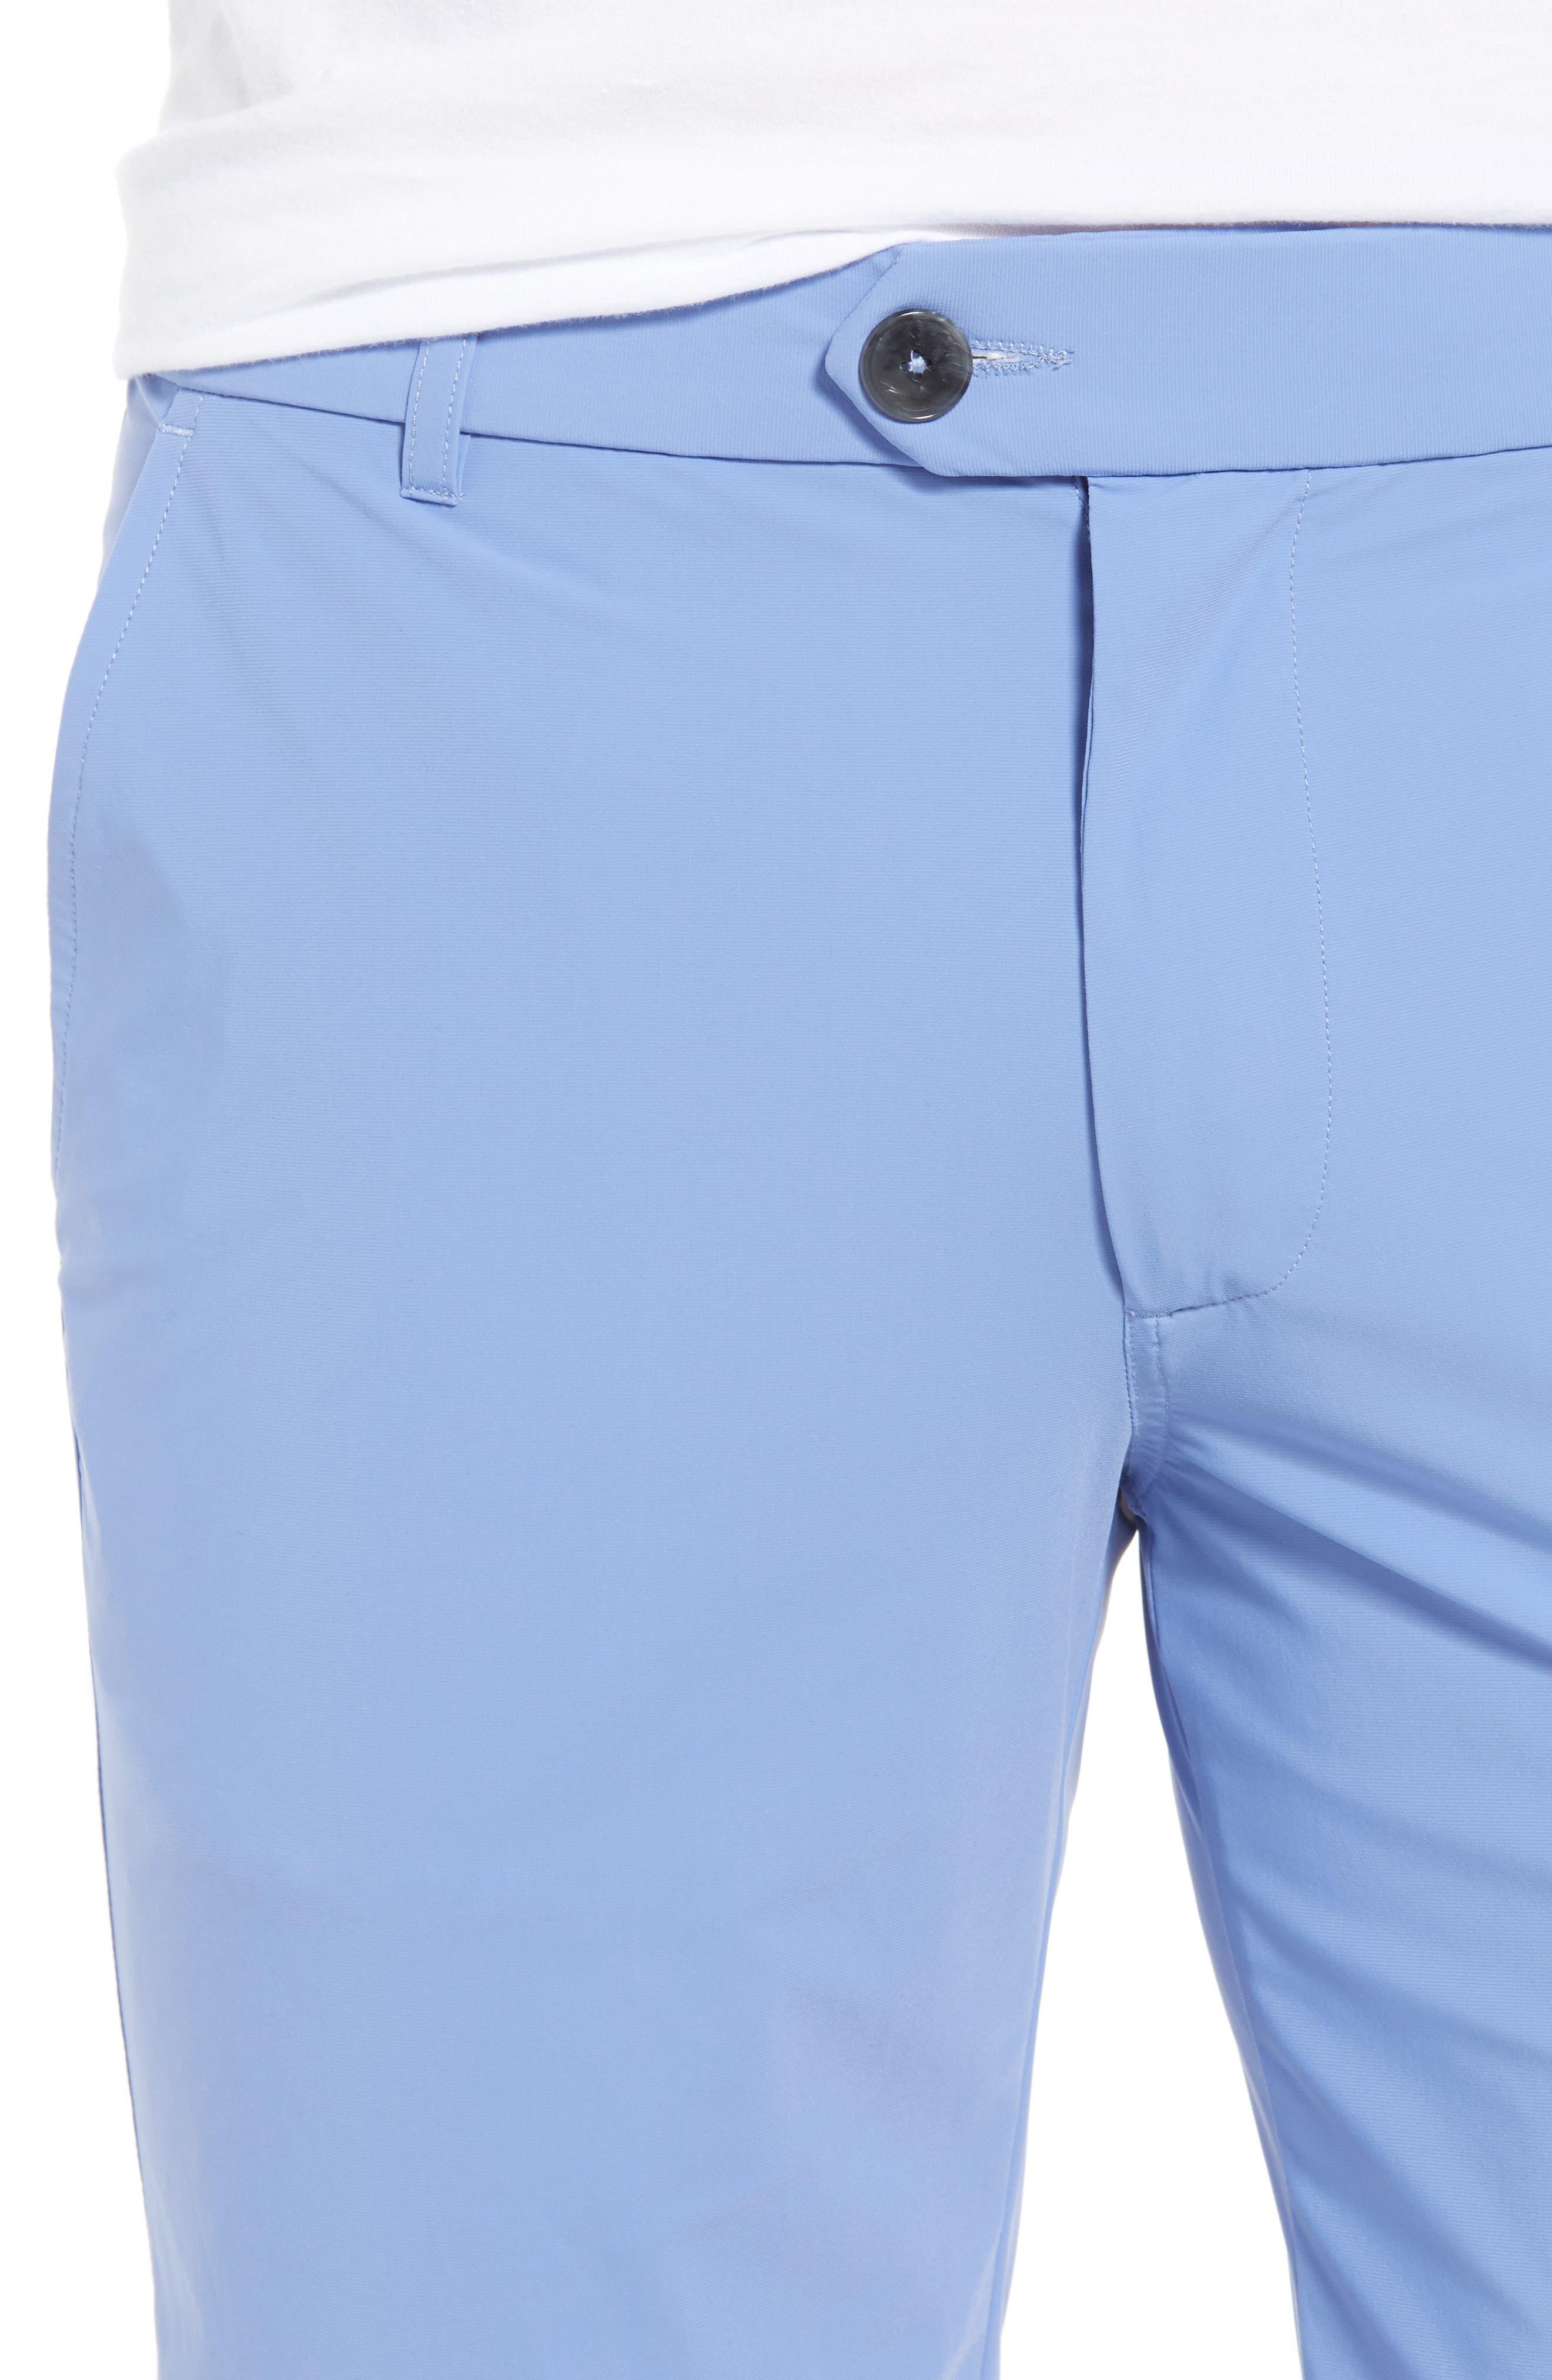 Montauk Shorts,                             Alternate thumbnail 4, color,                             COYOTE